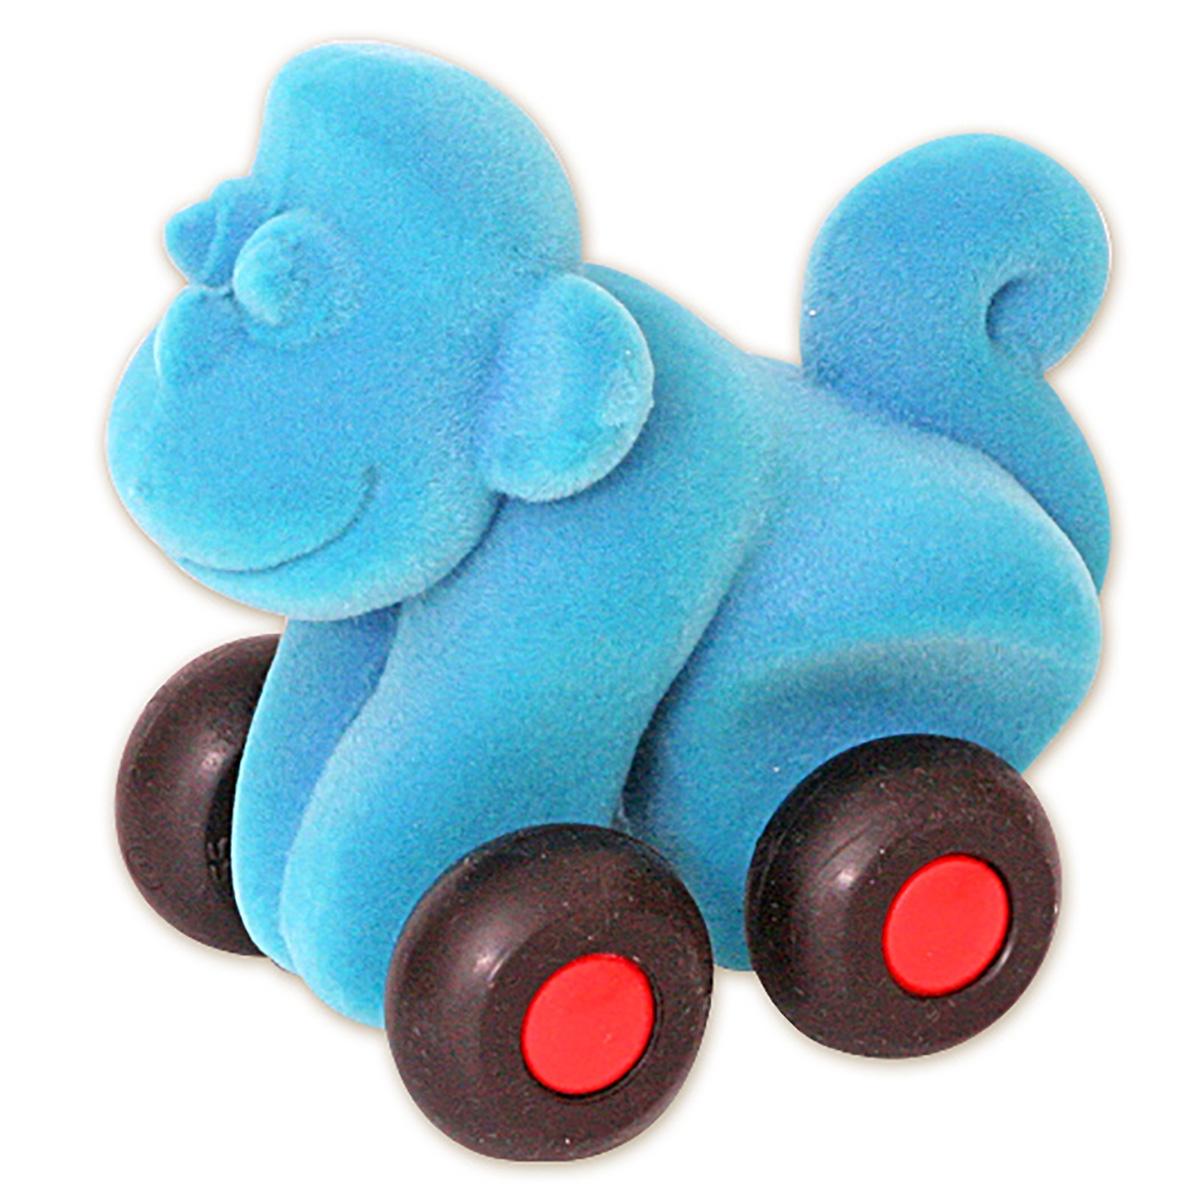 Обезьяна из каучука, 9 см, Rubbabu rubbabu фигурка функциональная обезьяна цвет синий